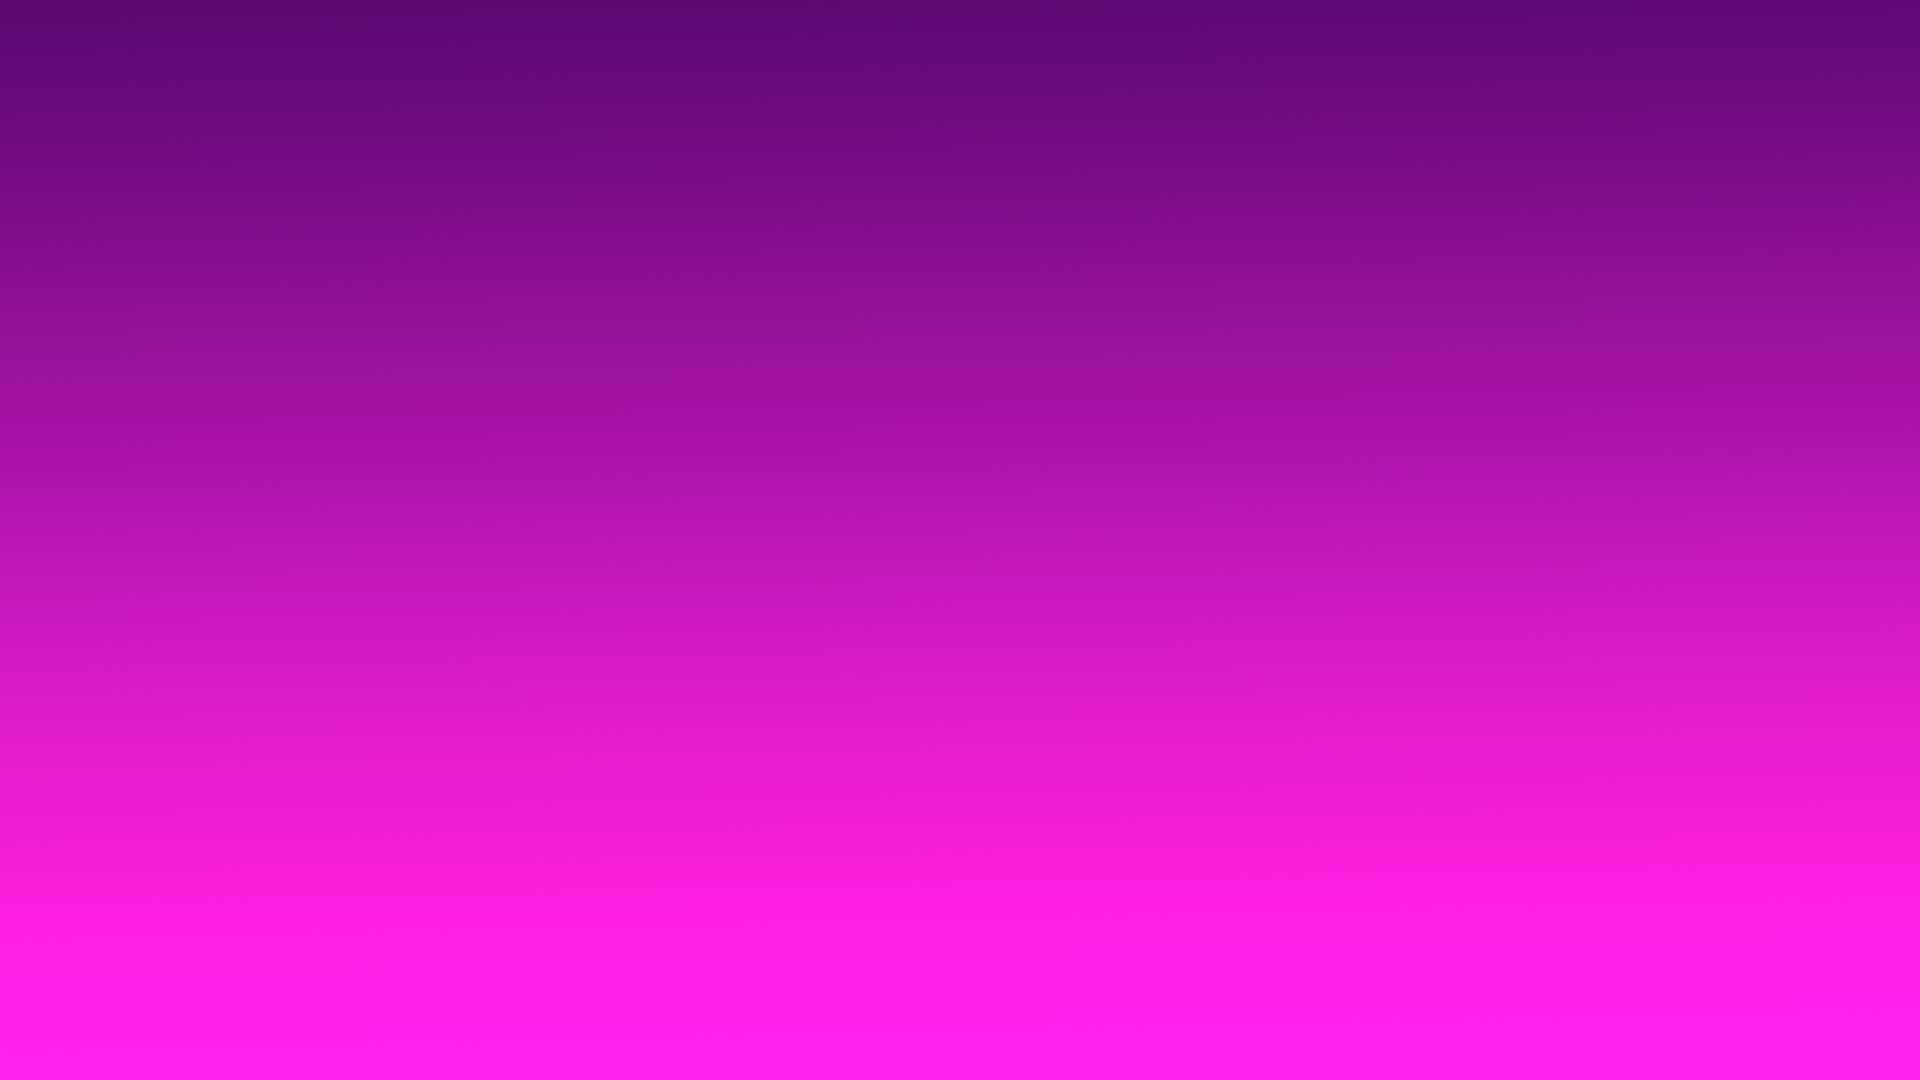 pink purple wallpaper wallpapersafari. Black Bedroom Furniture Sets. Home Design Ideas